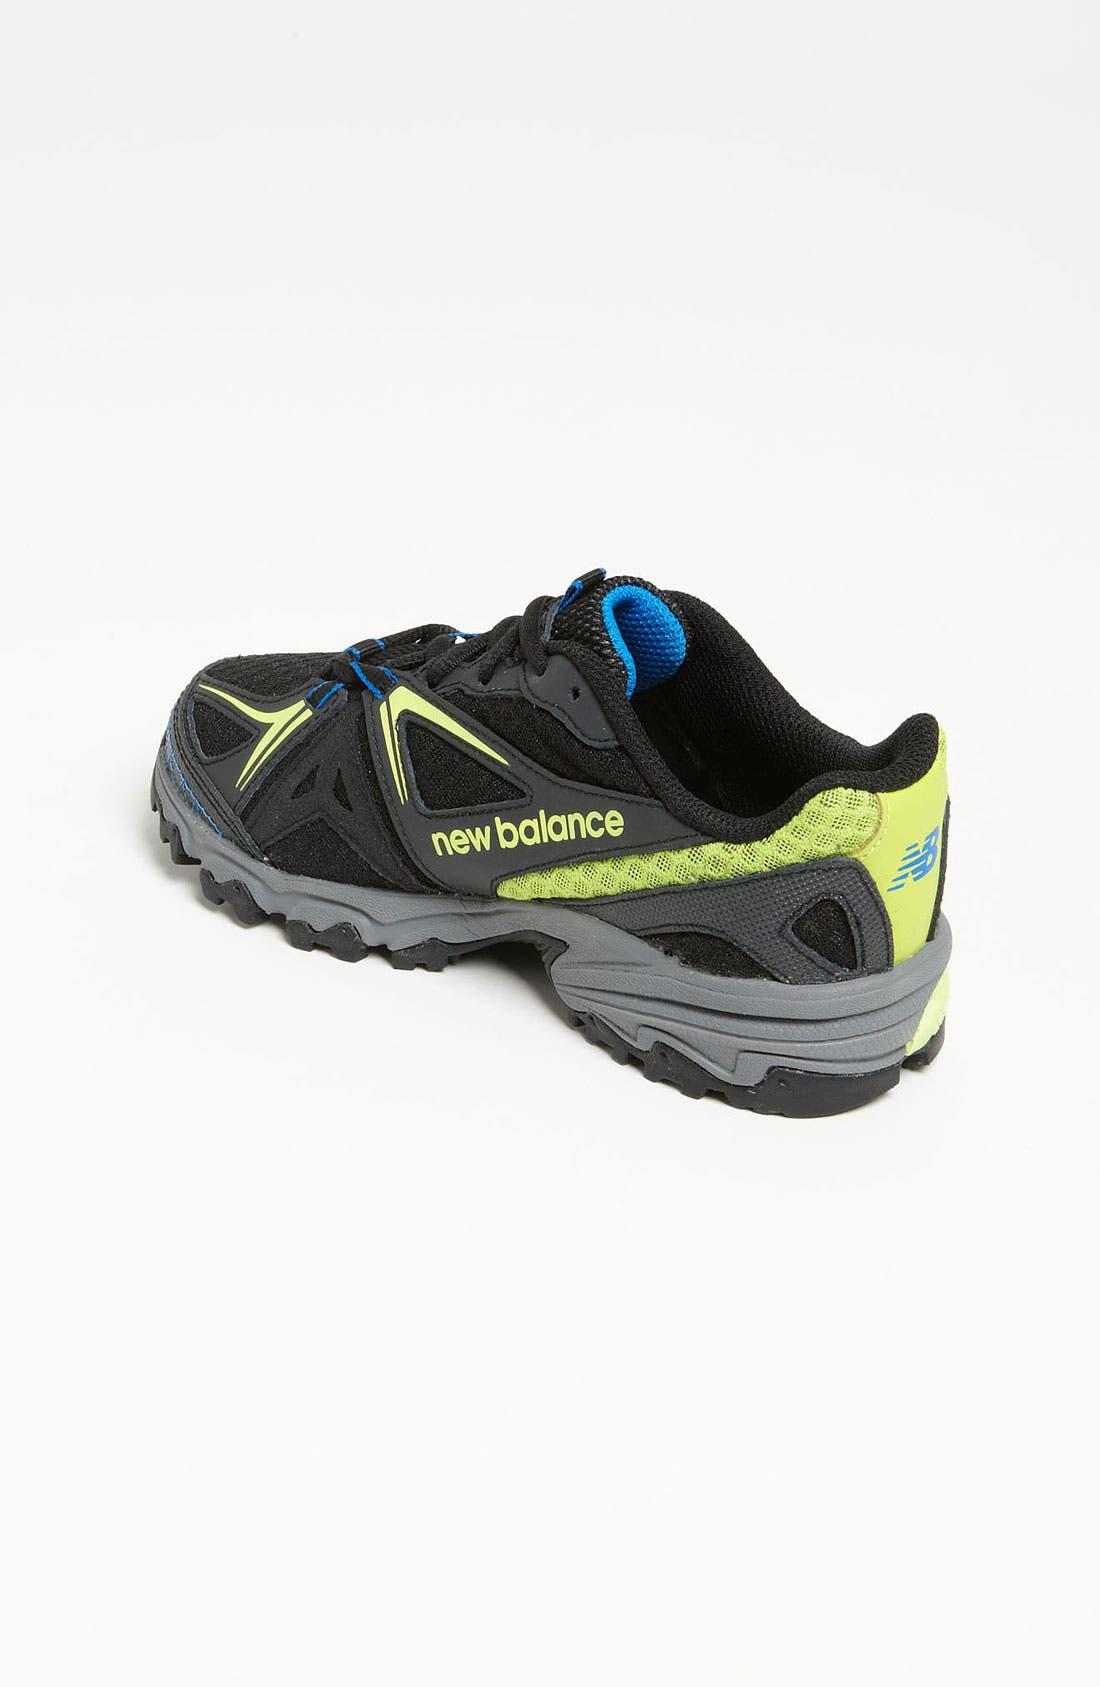 Alternate Image 2  - New Balance 'Takedown 610' Trail Running Shoe (Toddler, Little Kid & Big Kid)